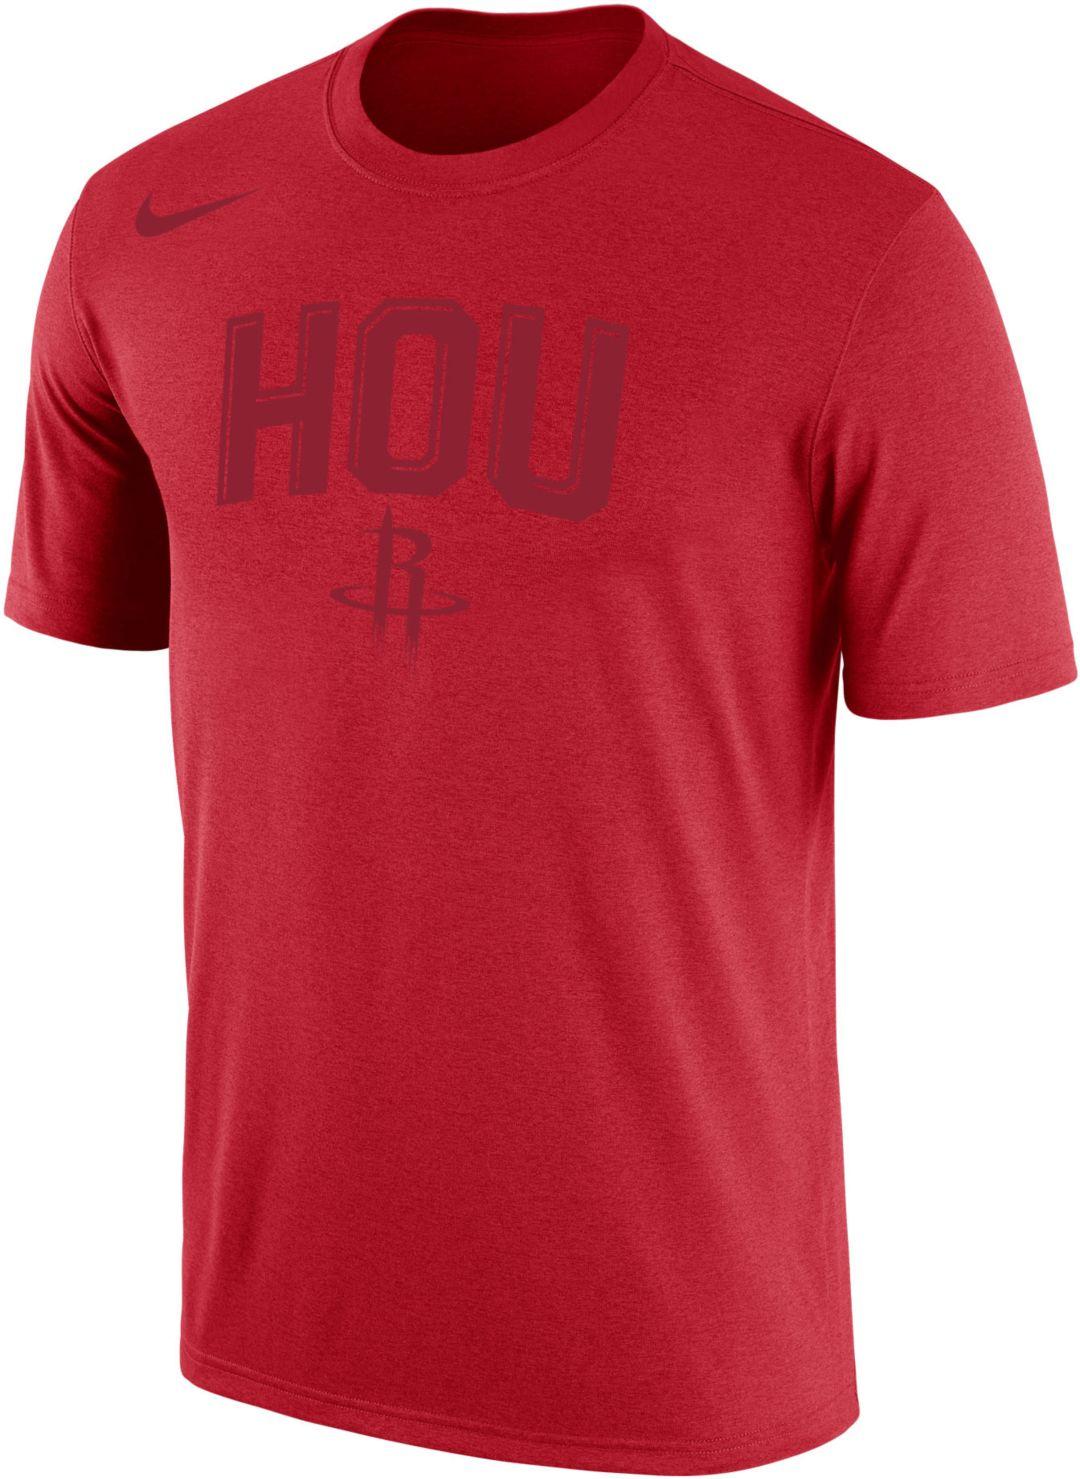 "the latest 125b5 c3bc6 Nike Men's Houston Rockets Dri-FIT ""HOU"" Red Shooting Shirt T-Shirt"